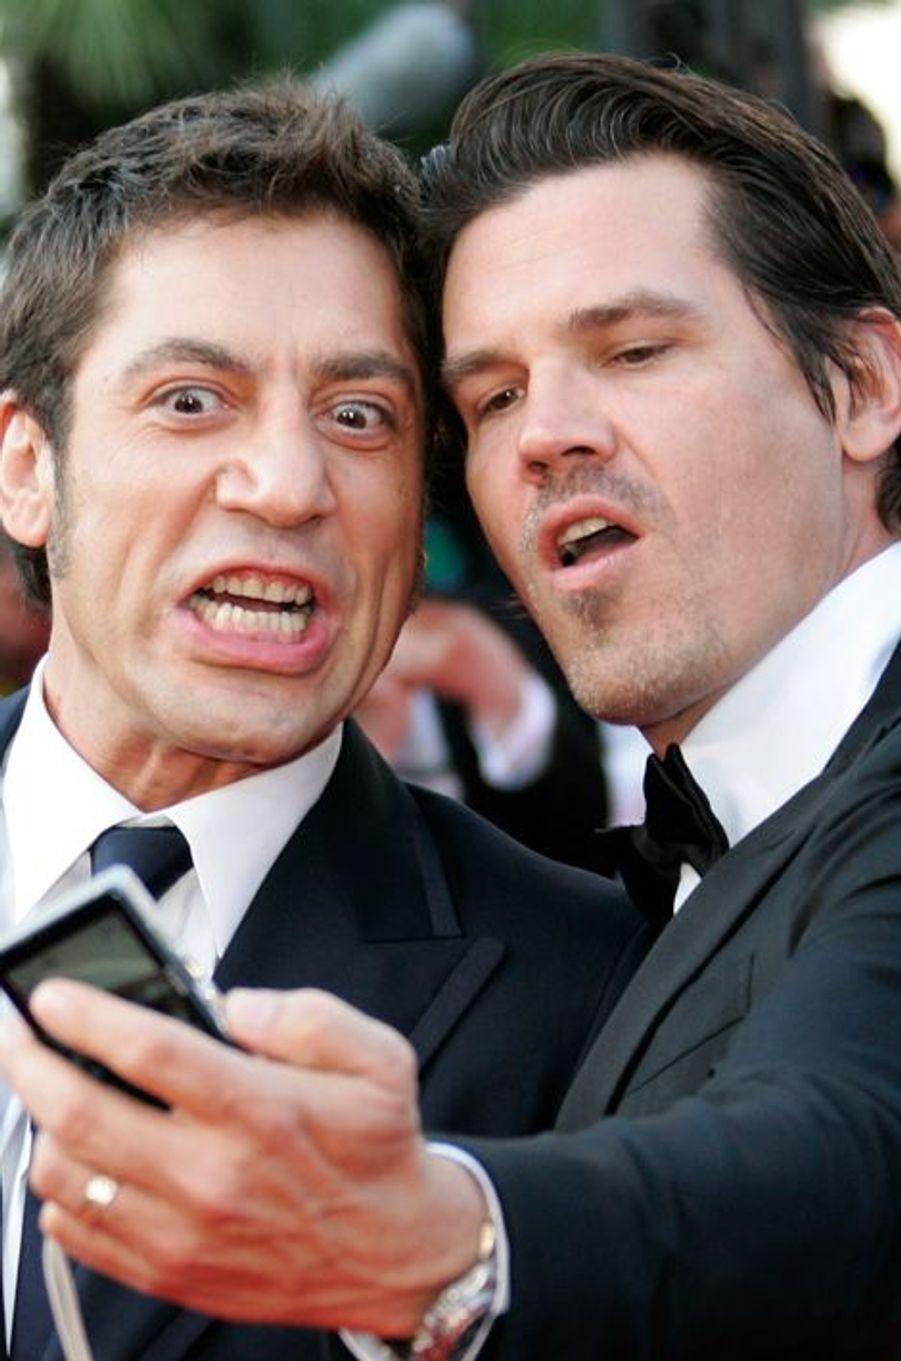 Javier Bardem et Josh Brolin au festival de Cannes en 2007